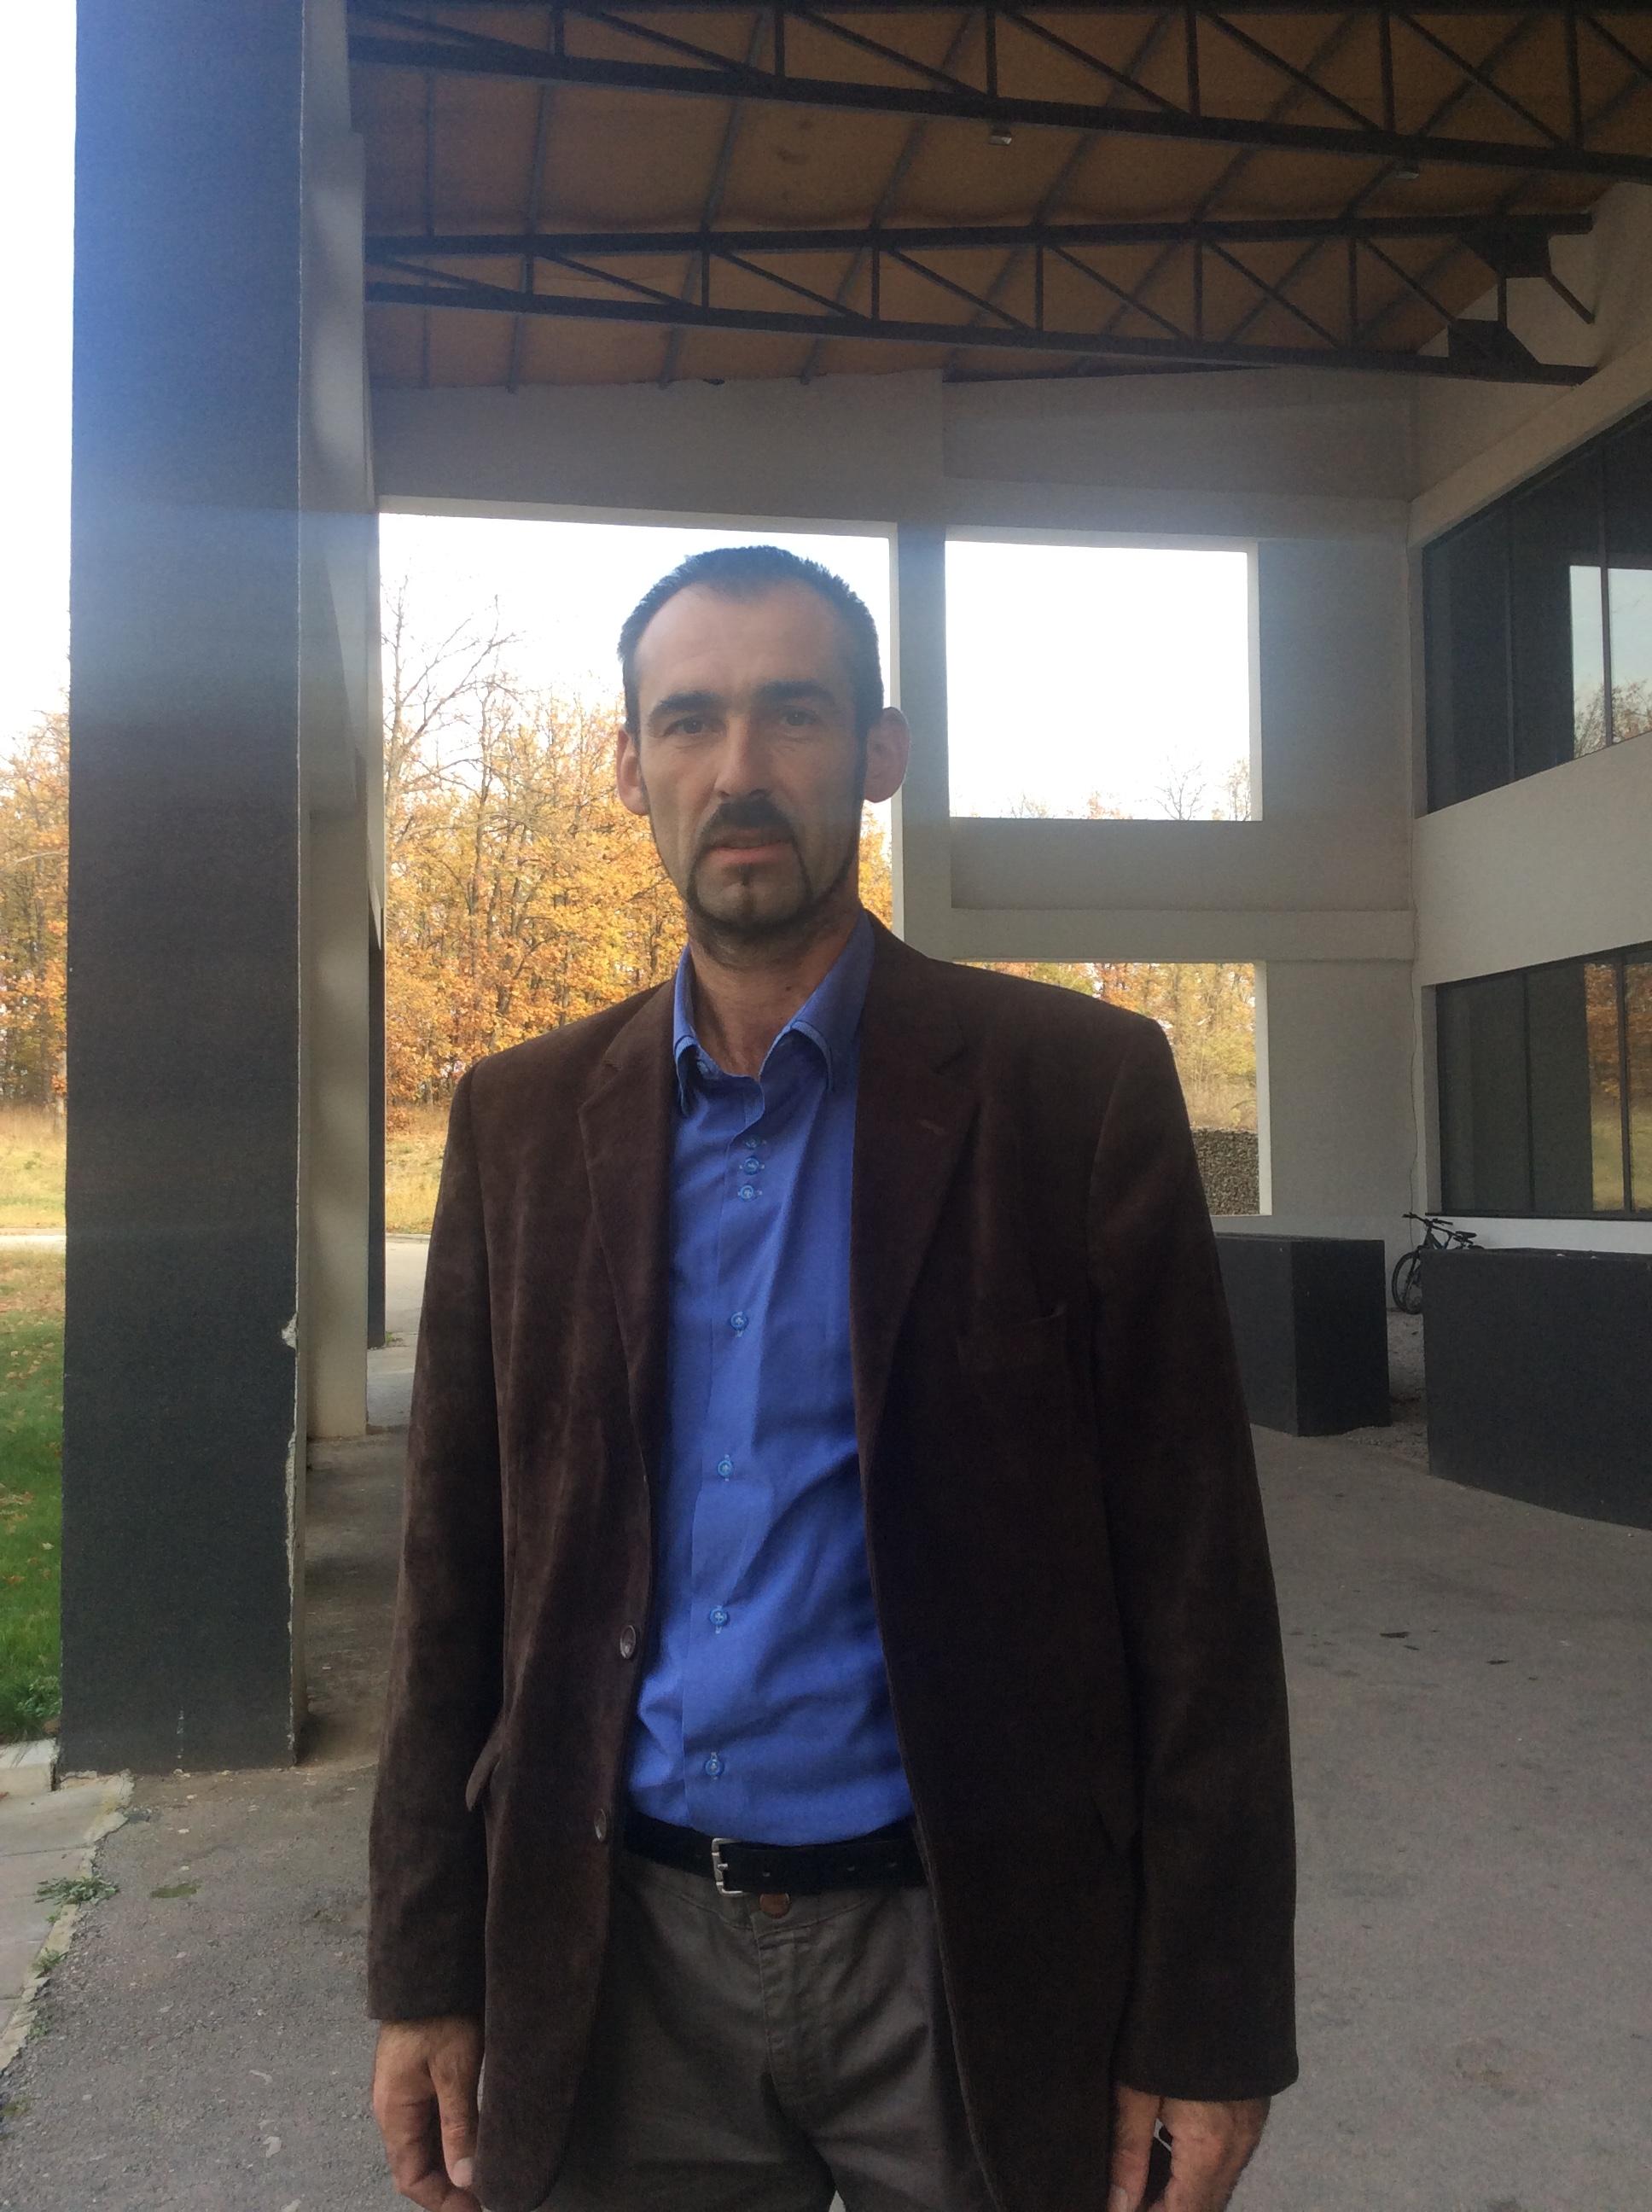 Preduzetništvo mladih je ključ opstanka Priboja veruje Goran Vučićević, predsednik Udruženja preduzetnika Foto--URP